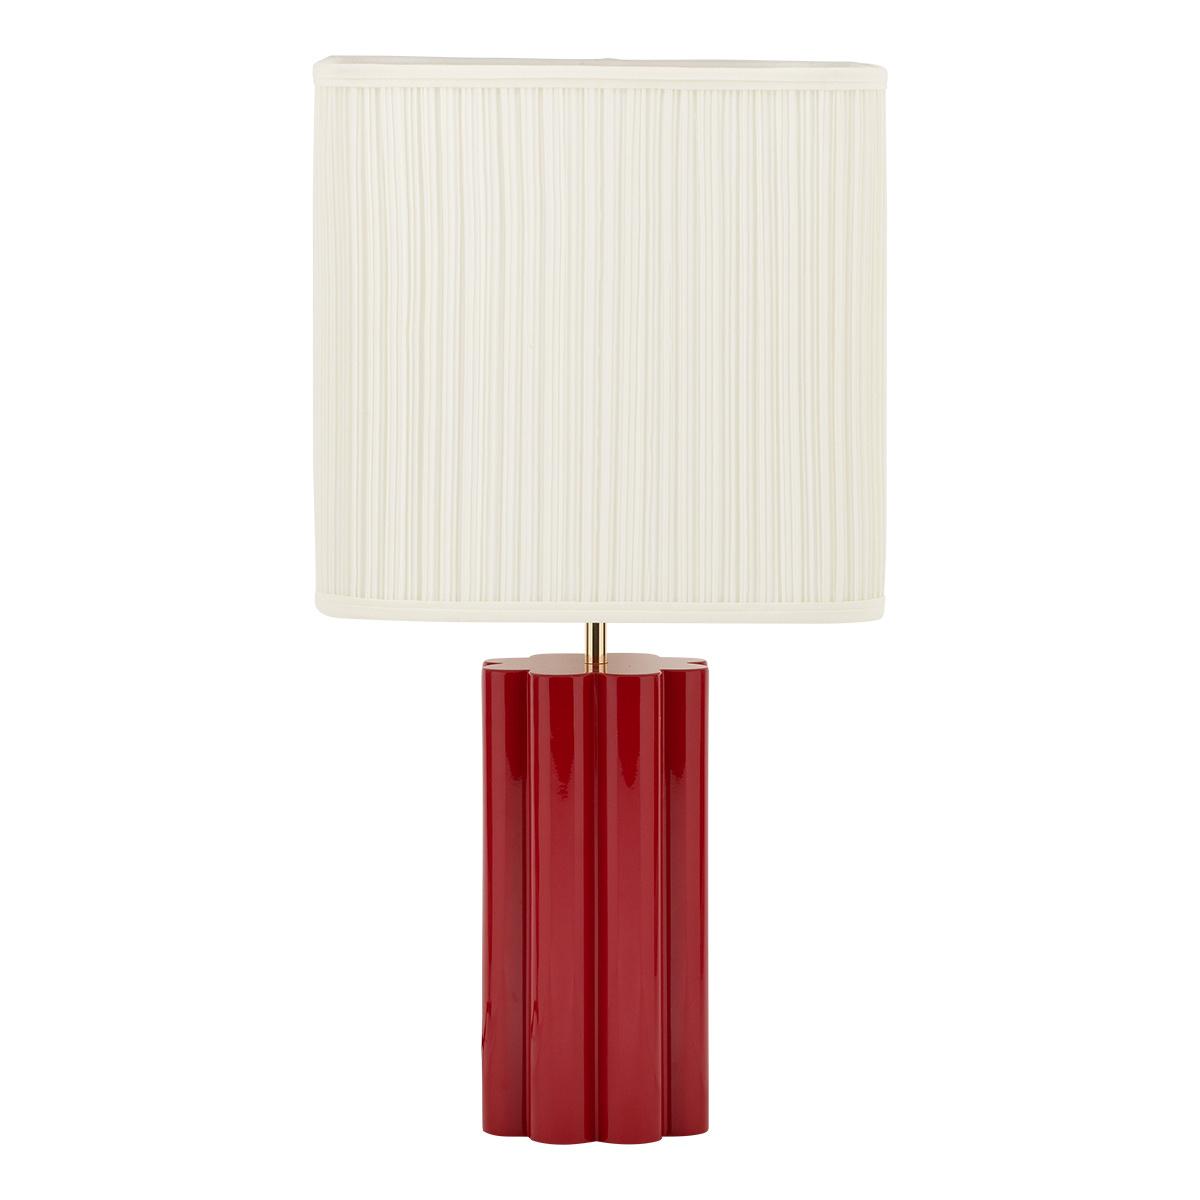 Lampe à poser Gioia rouge